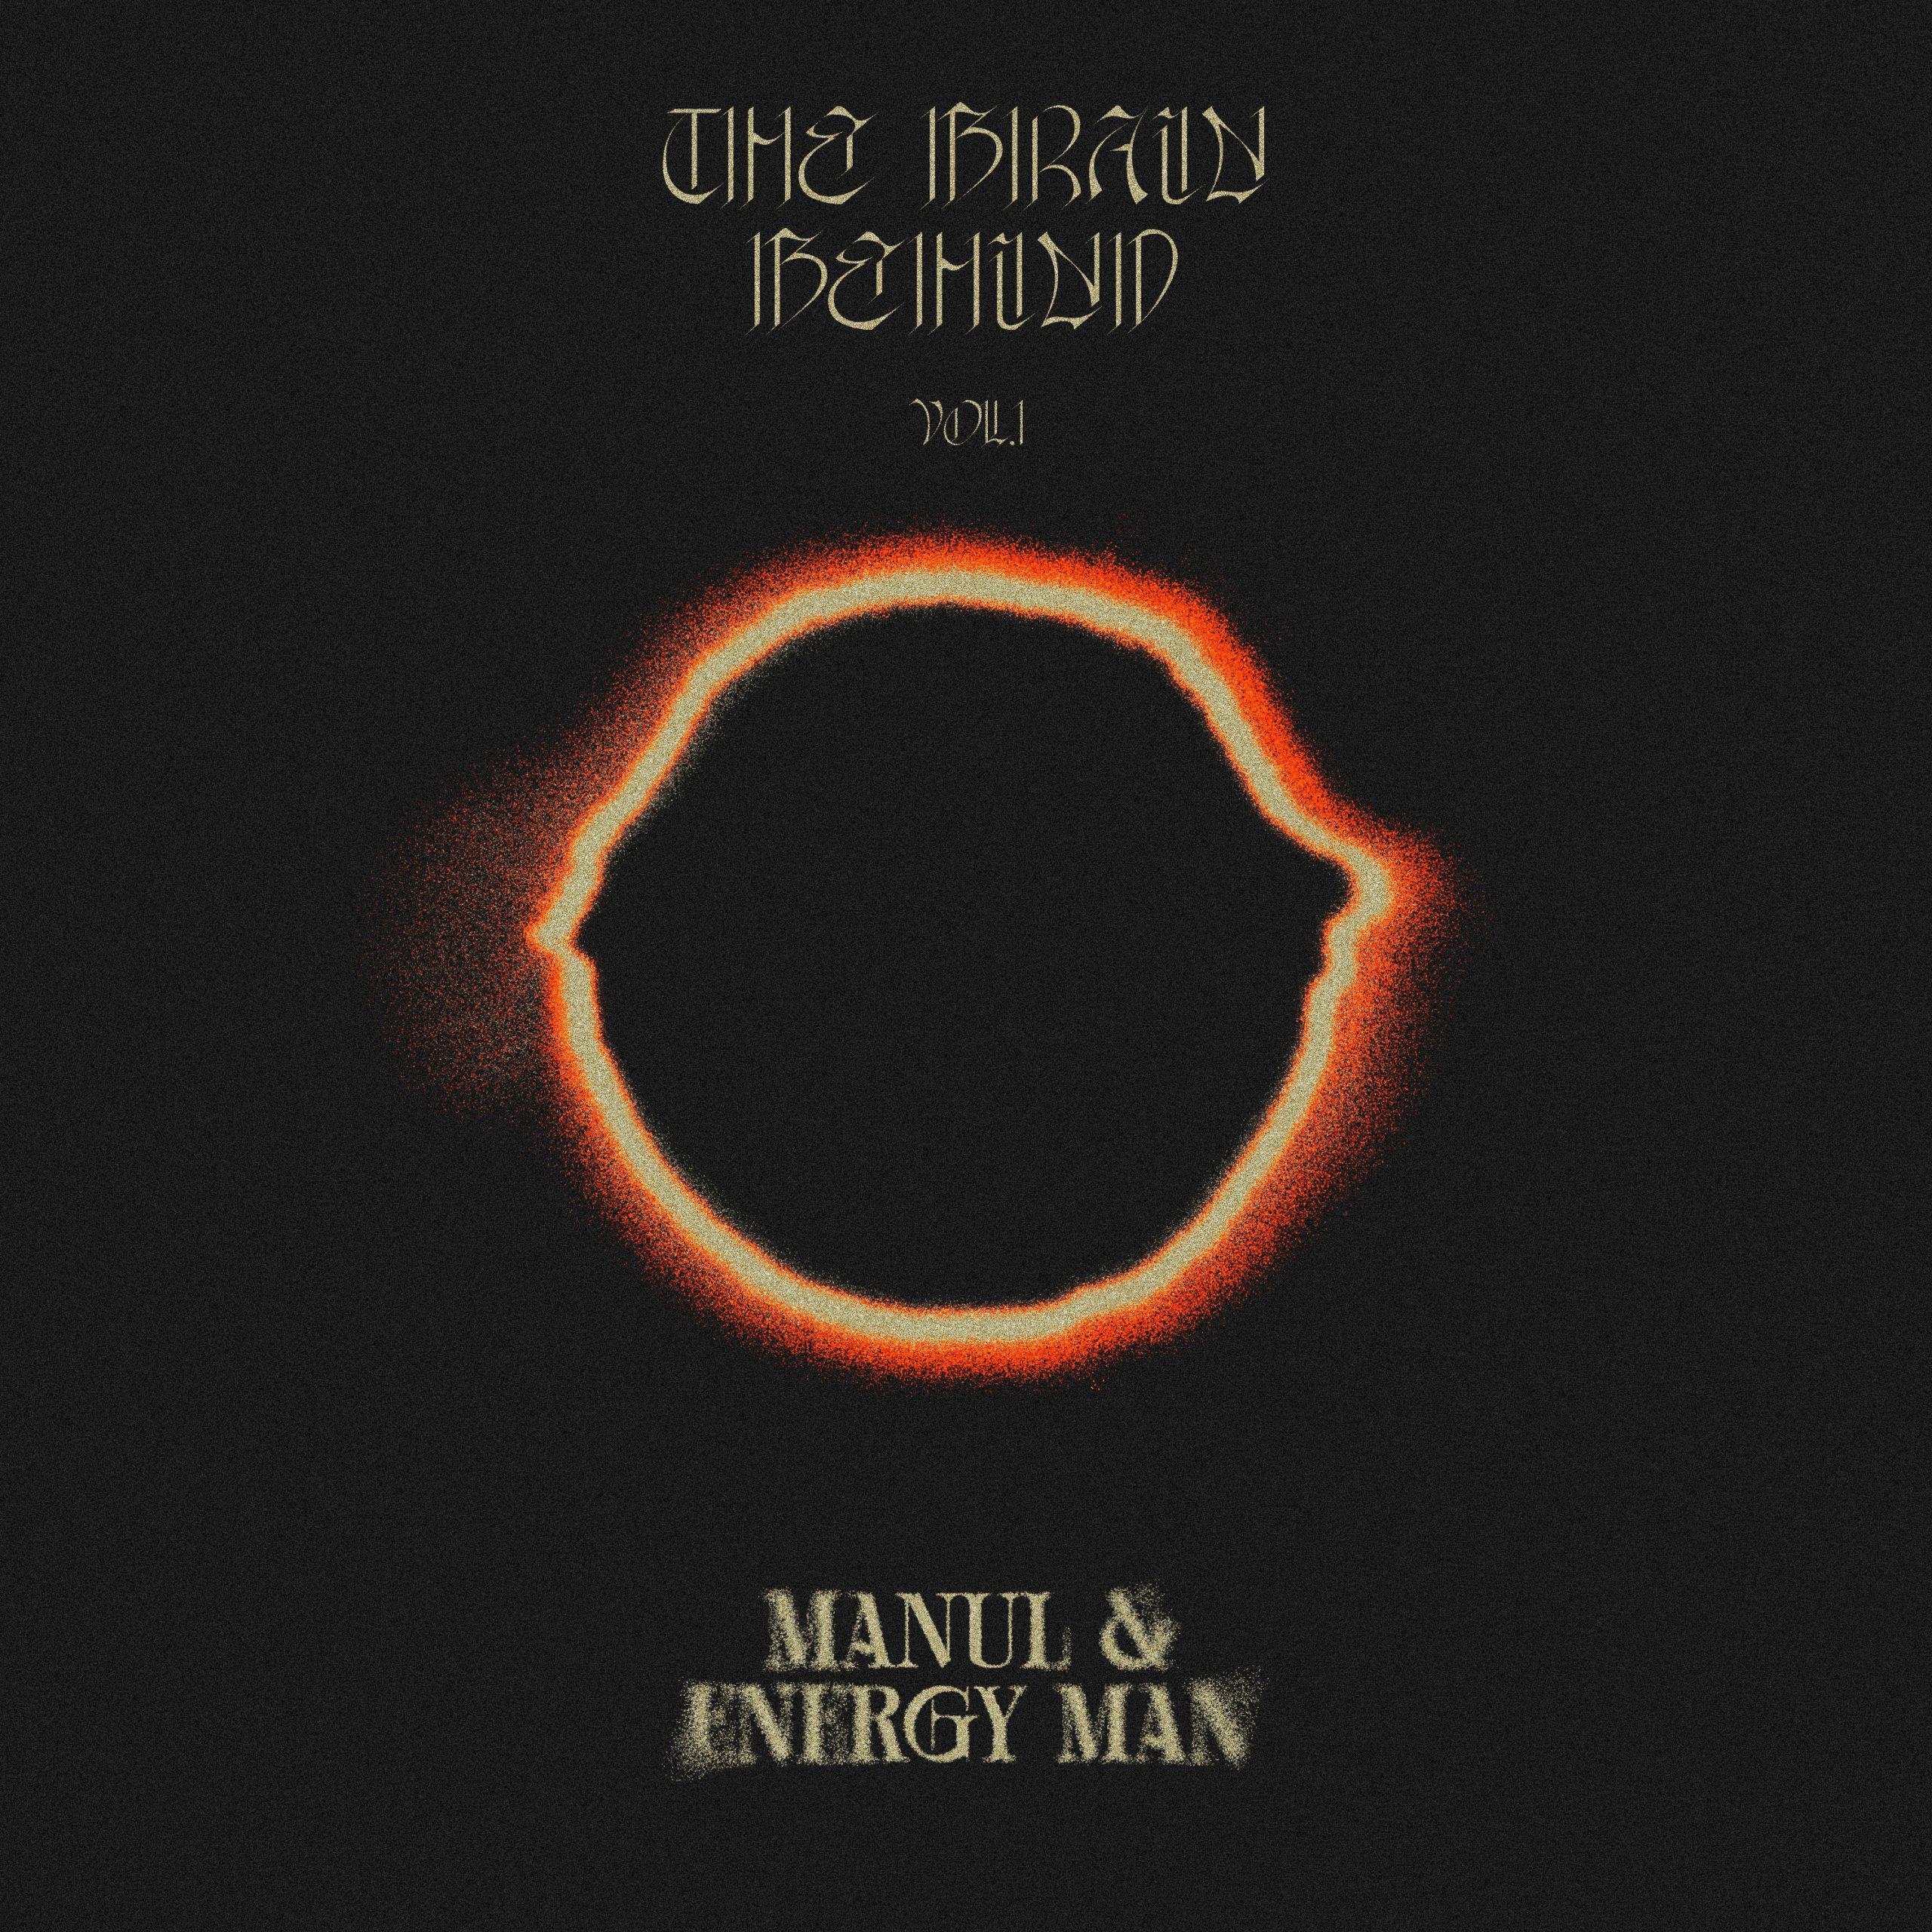 Manul & Energy Man - The brain behind Vol.1 (EP)